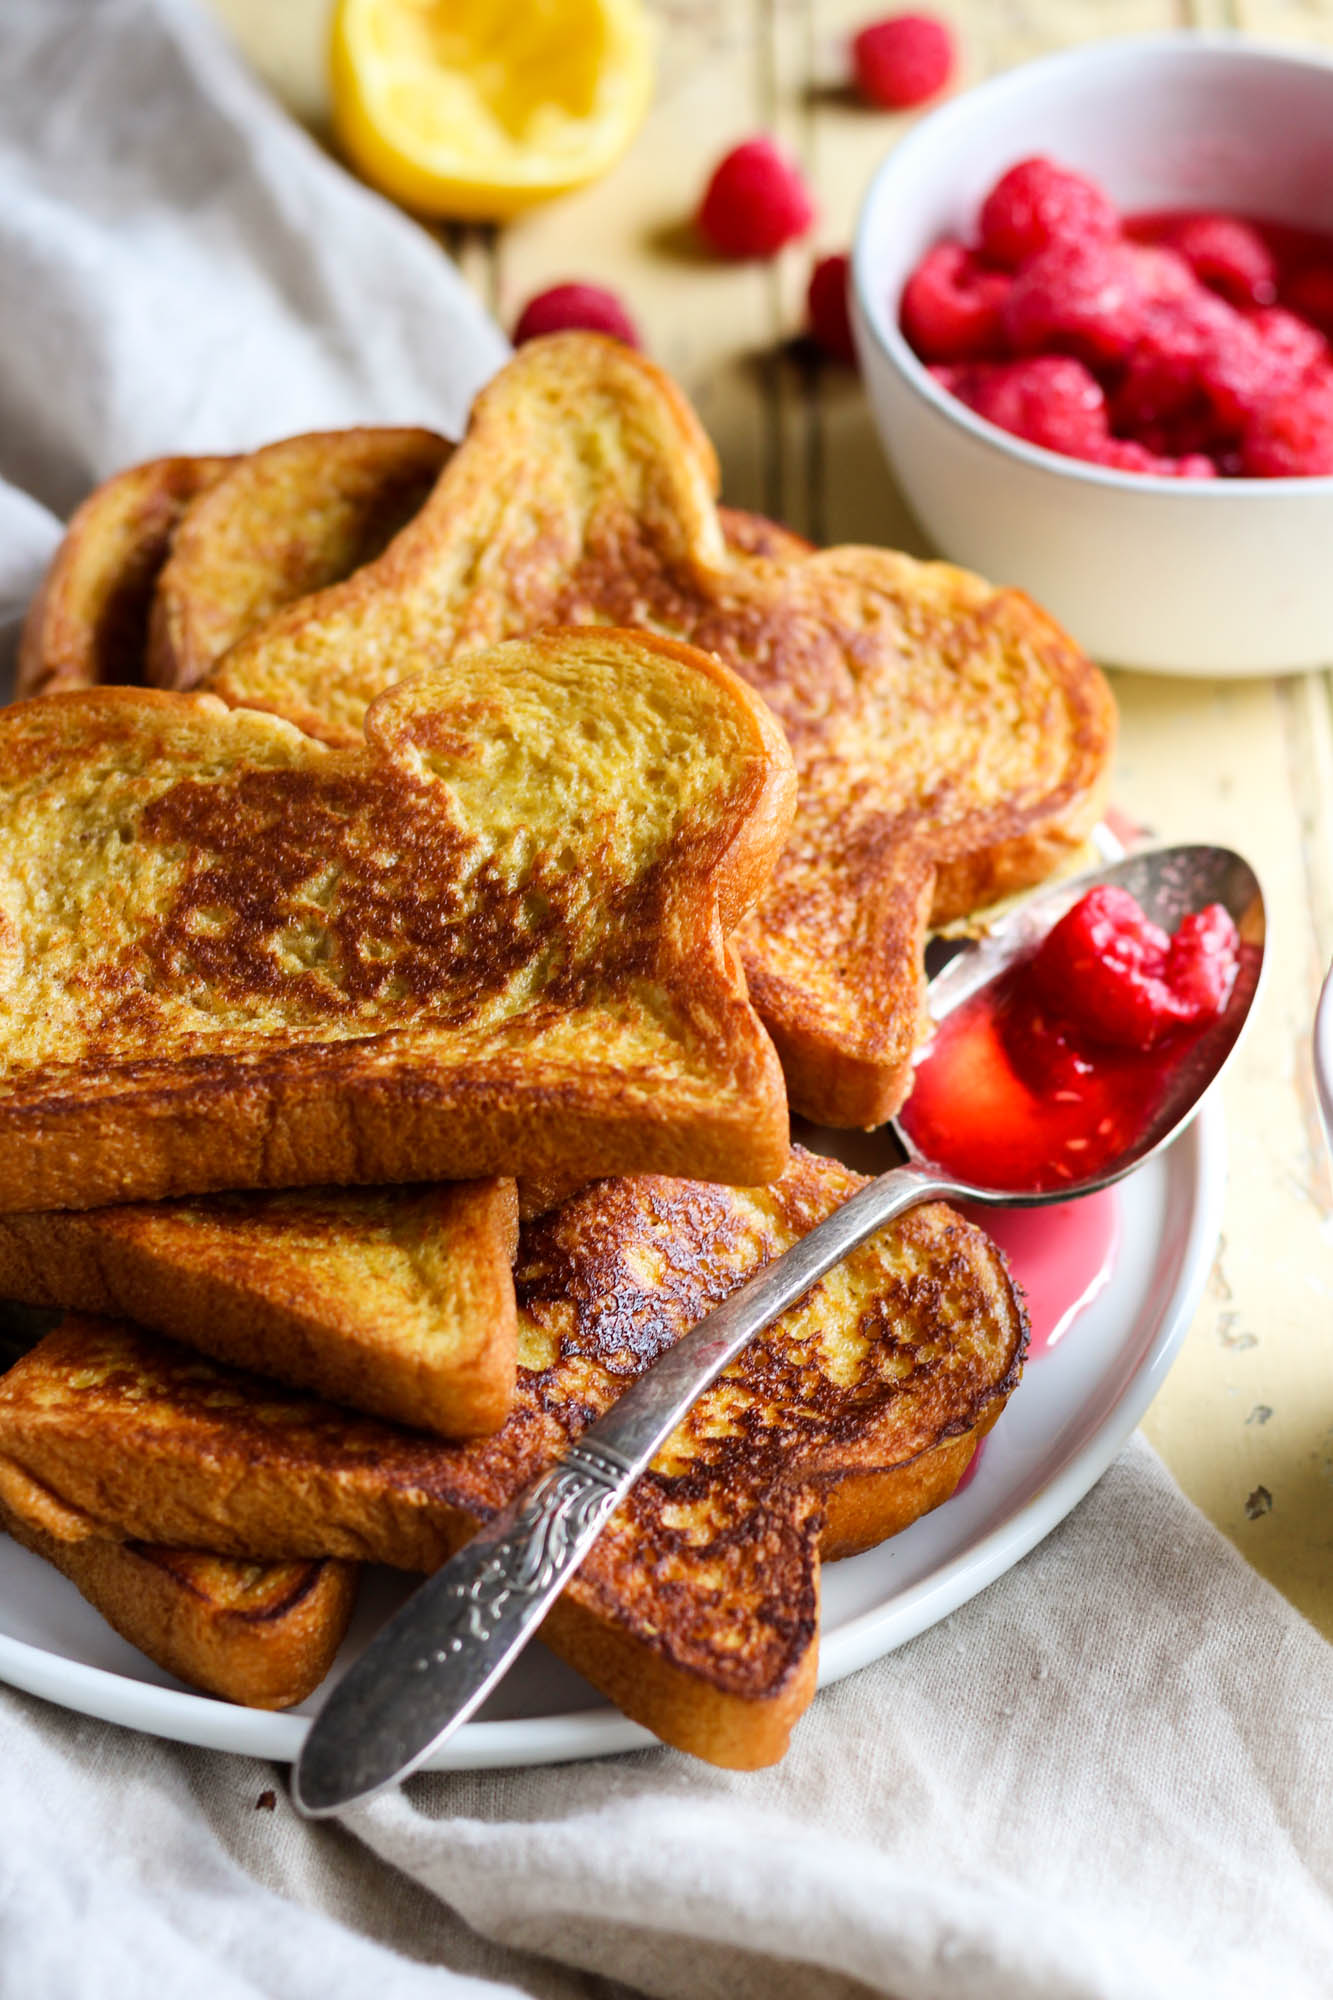 Freshly cooked cinnamon french toast